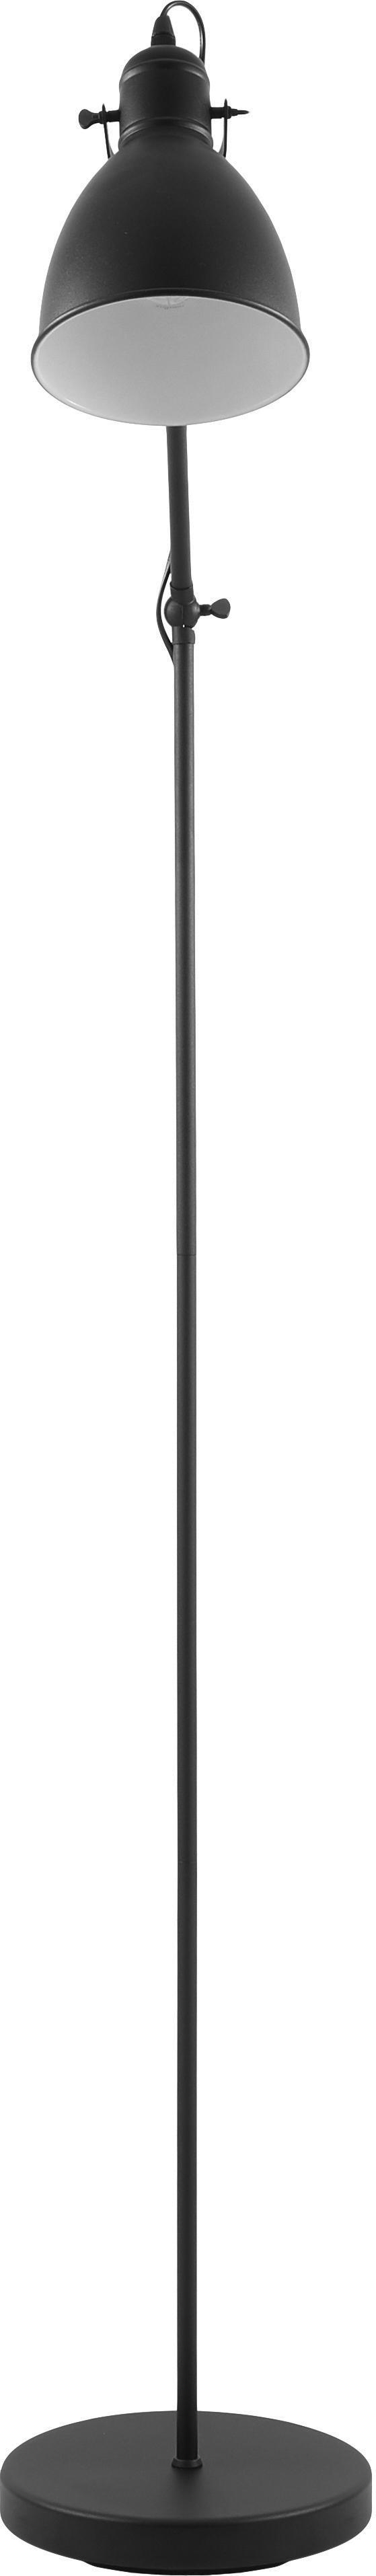 Industrial-Leselampe Ethan aus Metall, Lampenschirm: Metall, pulverbeschichtet, Lampenfuß: Metall, pulverbeschichtet, Schwarz, ∅ 15 x H 137 cm